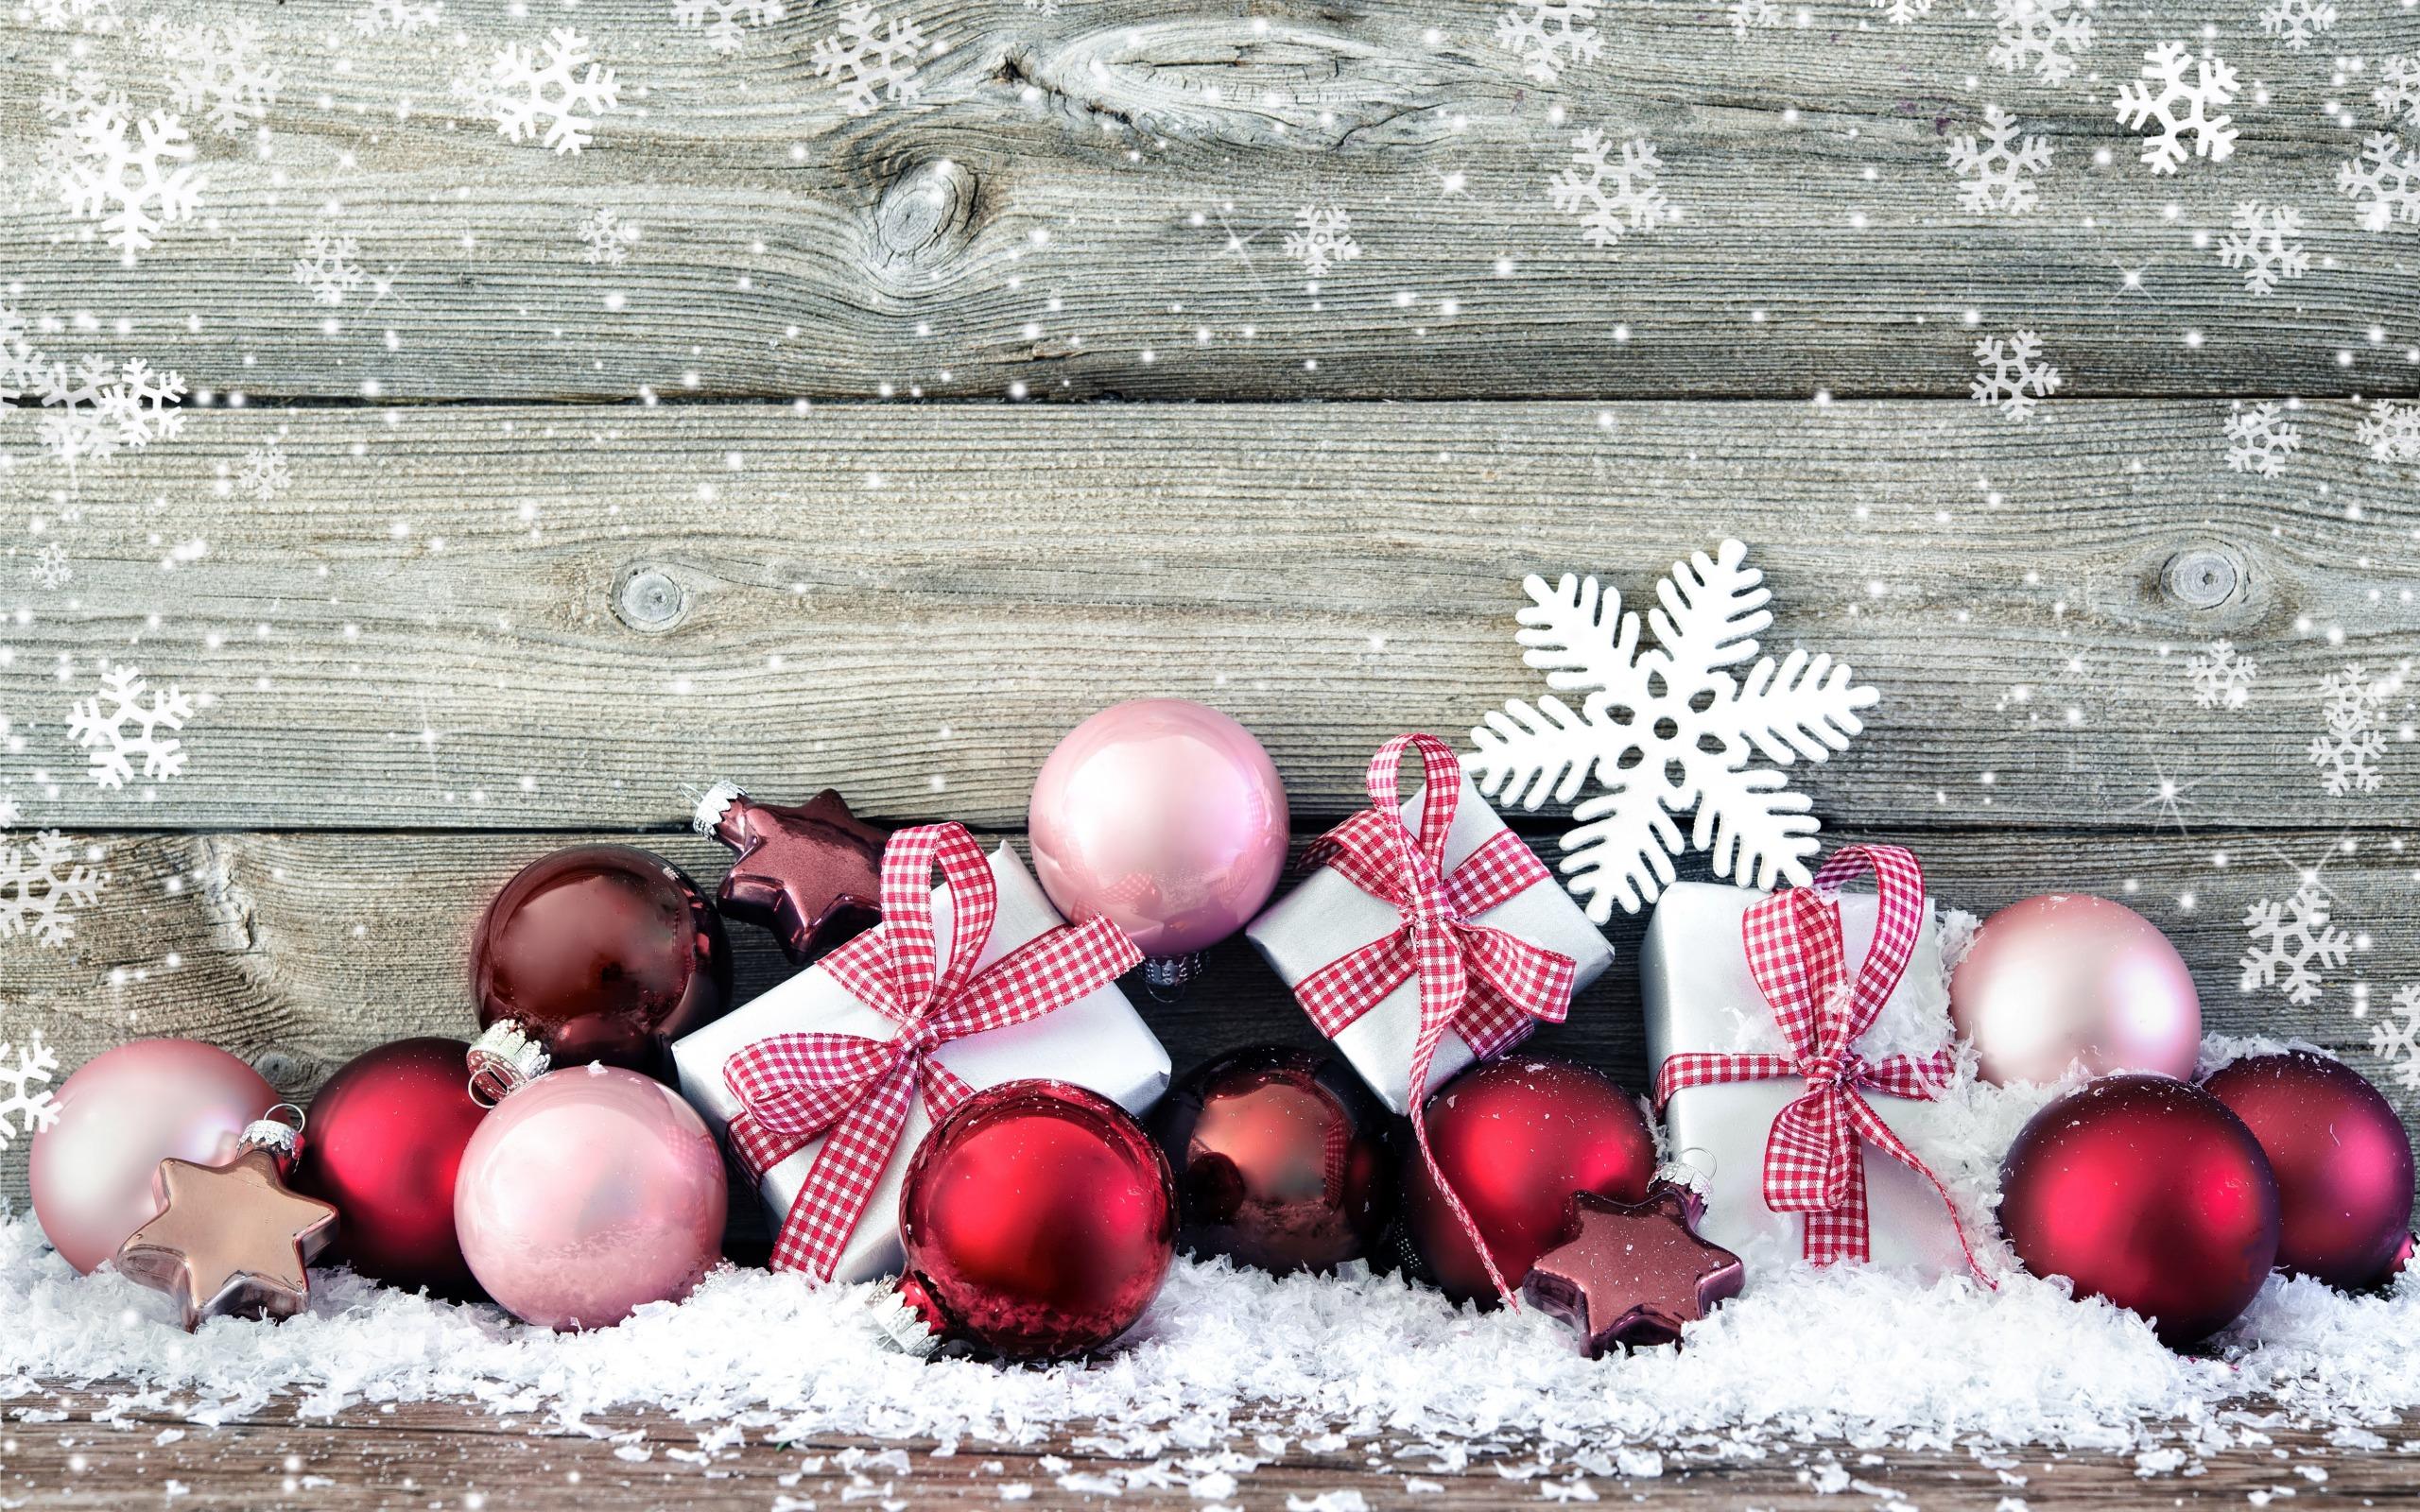 Snowy Christmas Desktop Background - HD Wallpaper